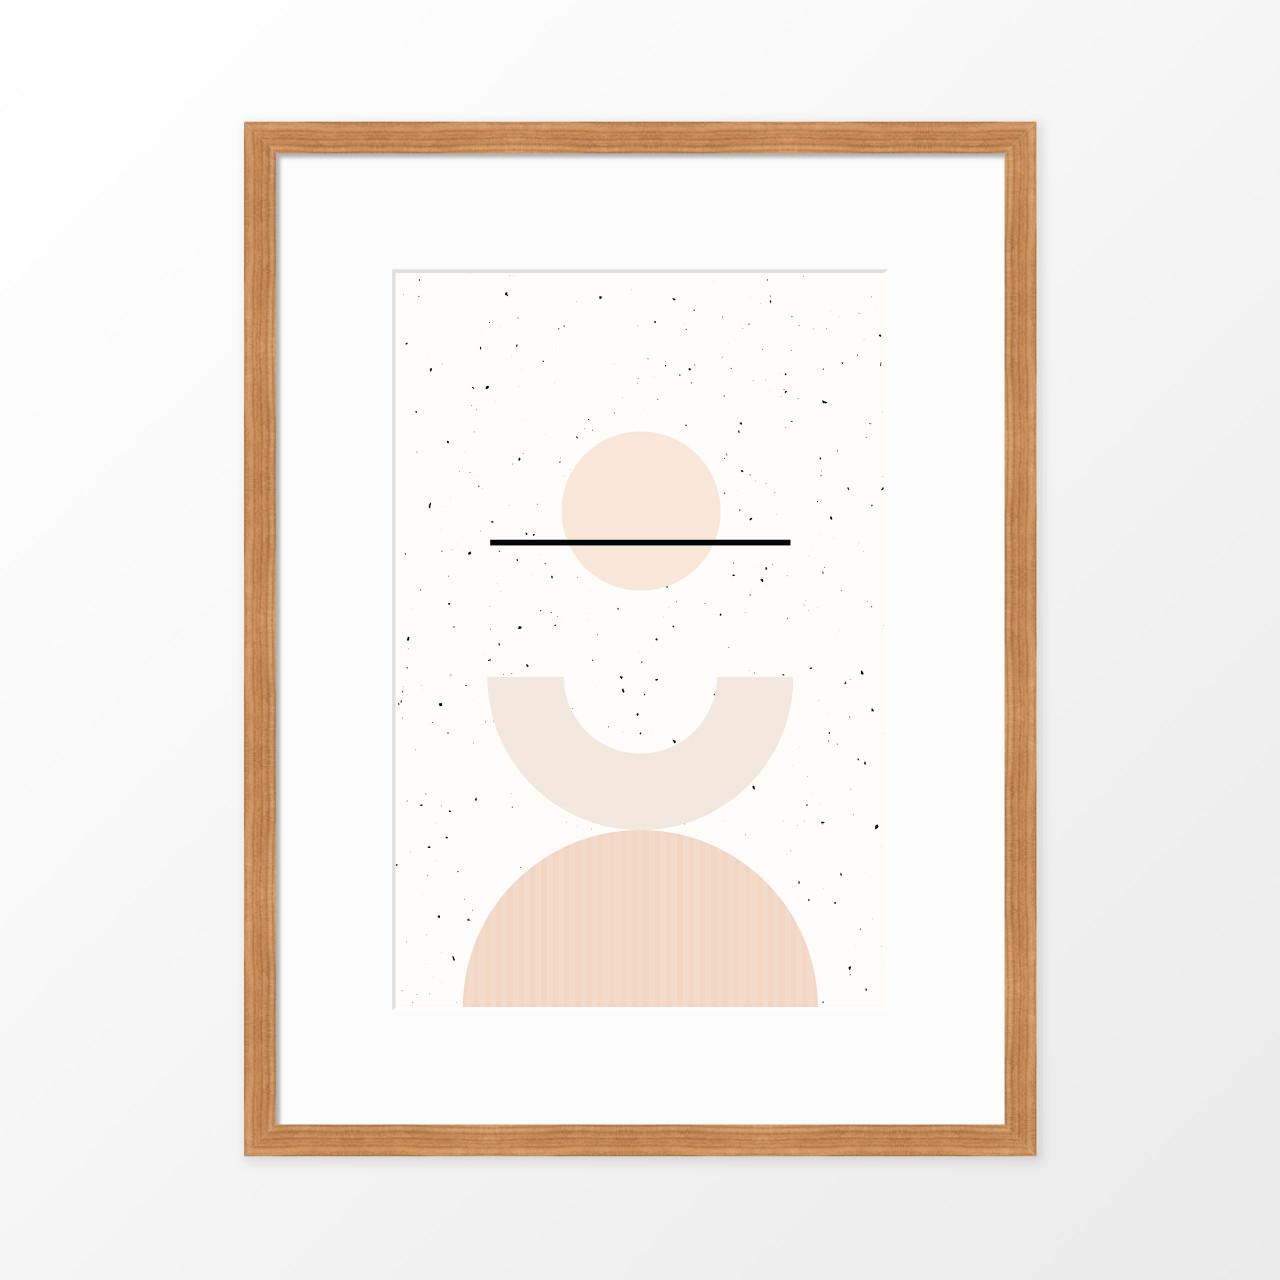 'Shapes + Flecks I' Minimalist Geometric Art Print from The Printed Home (Printable)